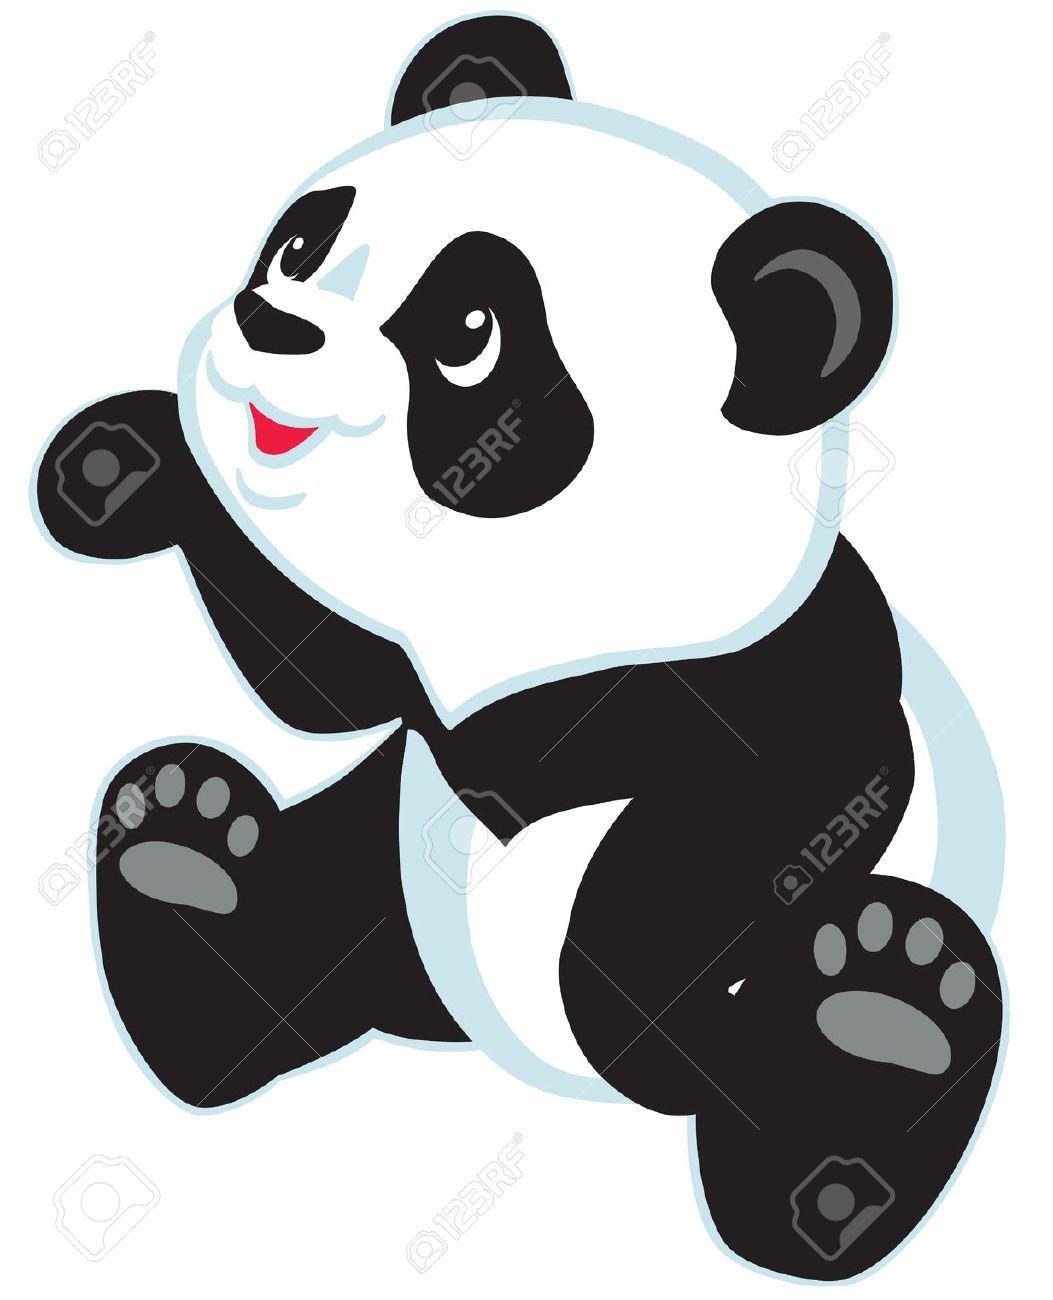 Imagen De Oso Panda Tierno Imagenes De Pandas Pandas Animados Pandas Dibujo